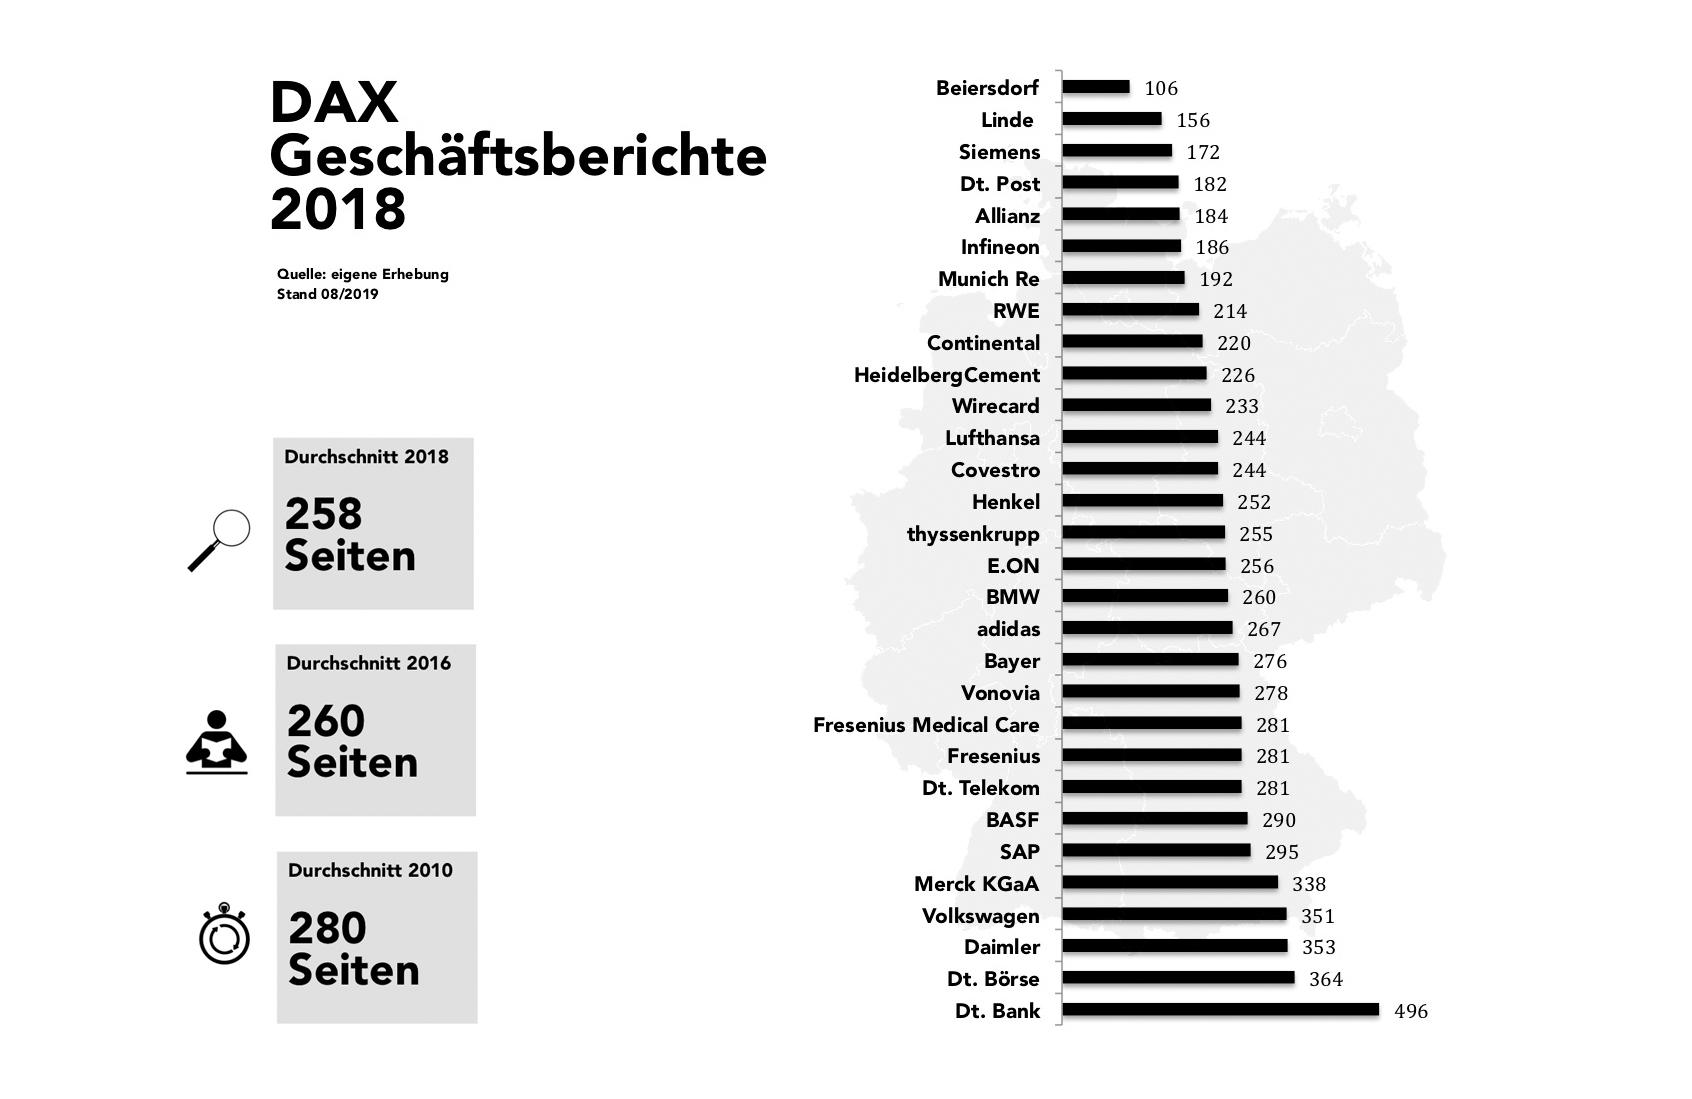 DAX-Geschäftsberichte 2018: Seitenumfang